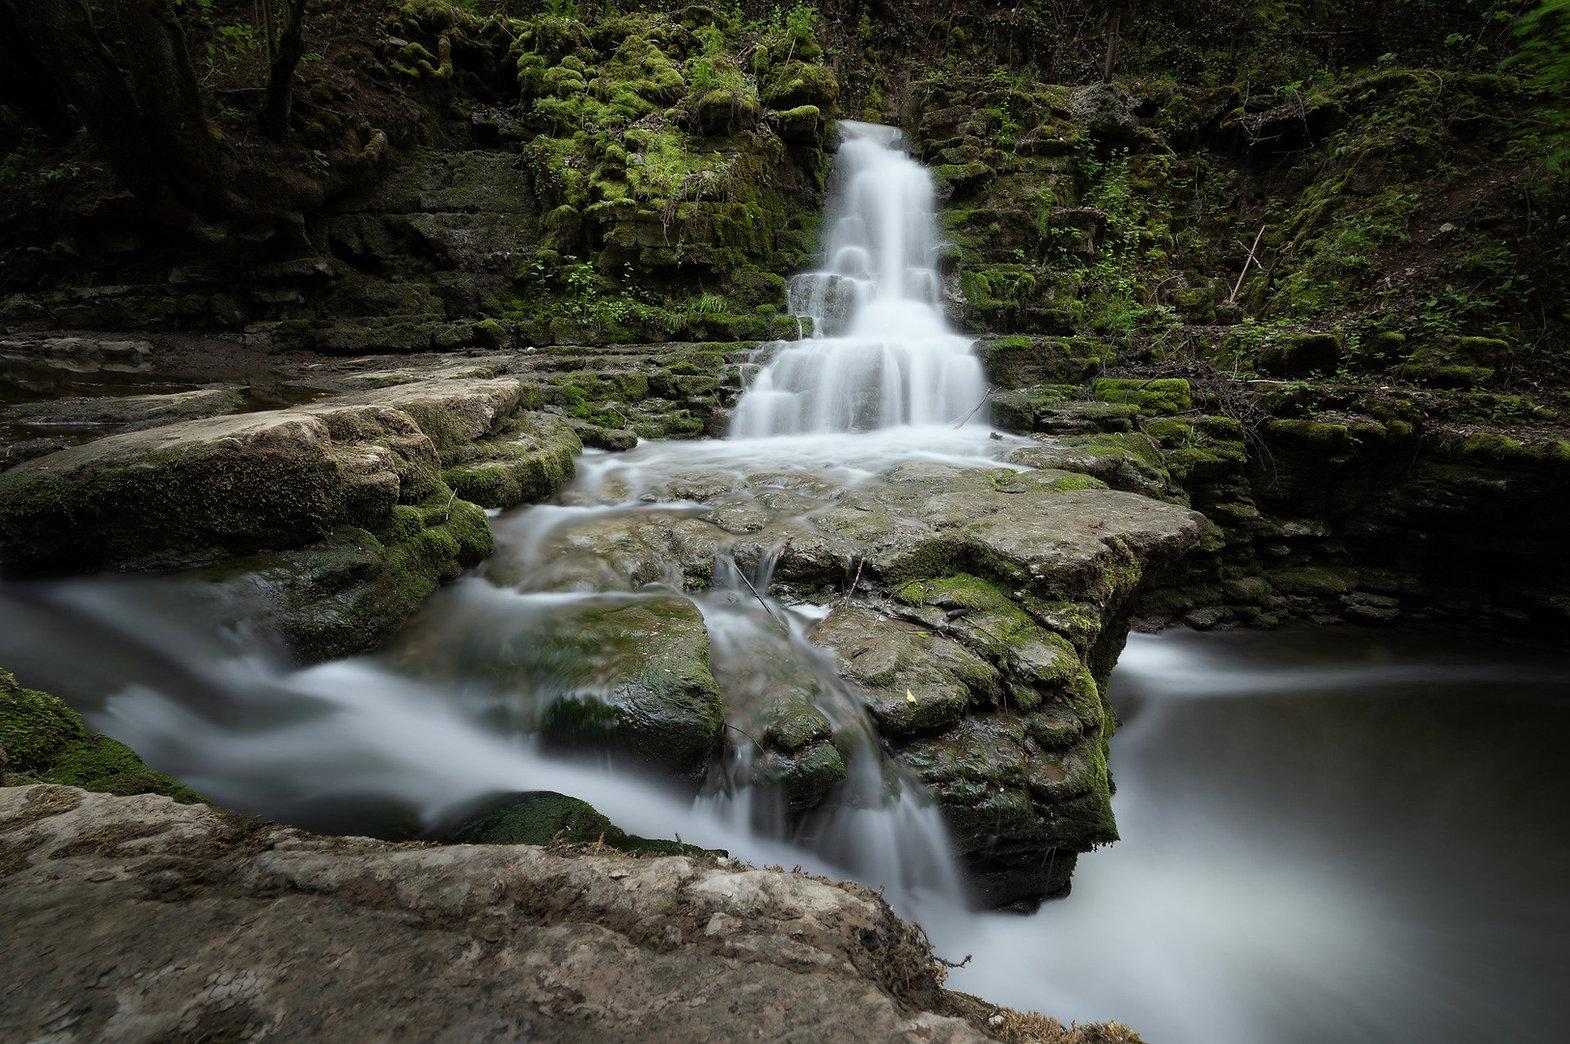 waterfall-5138793_1920.jpg